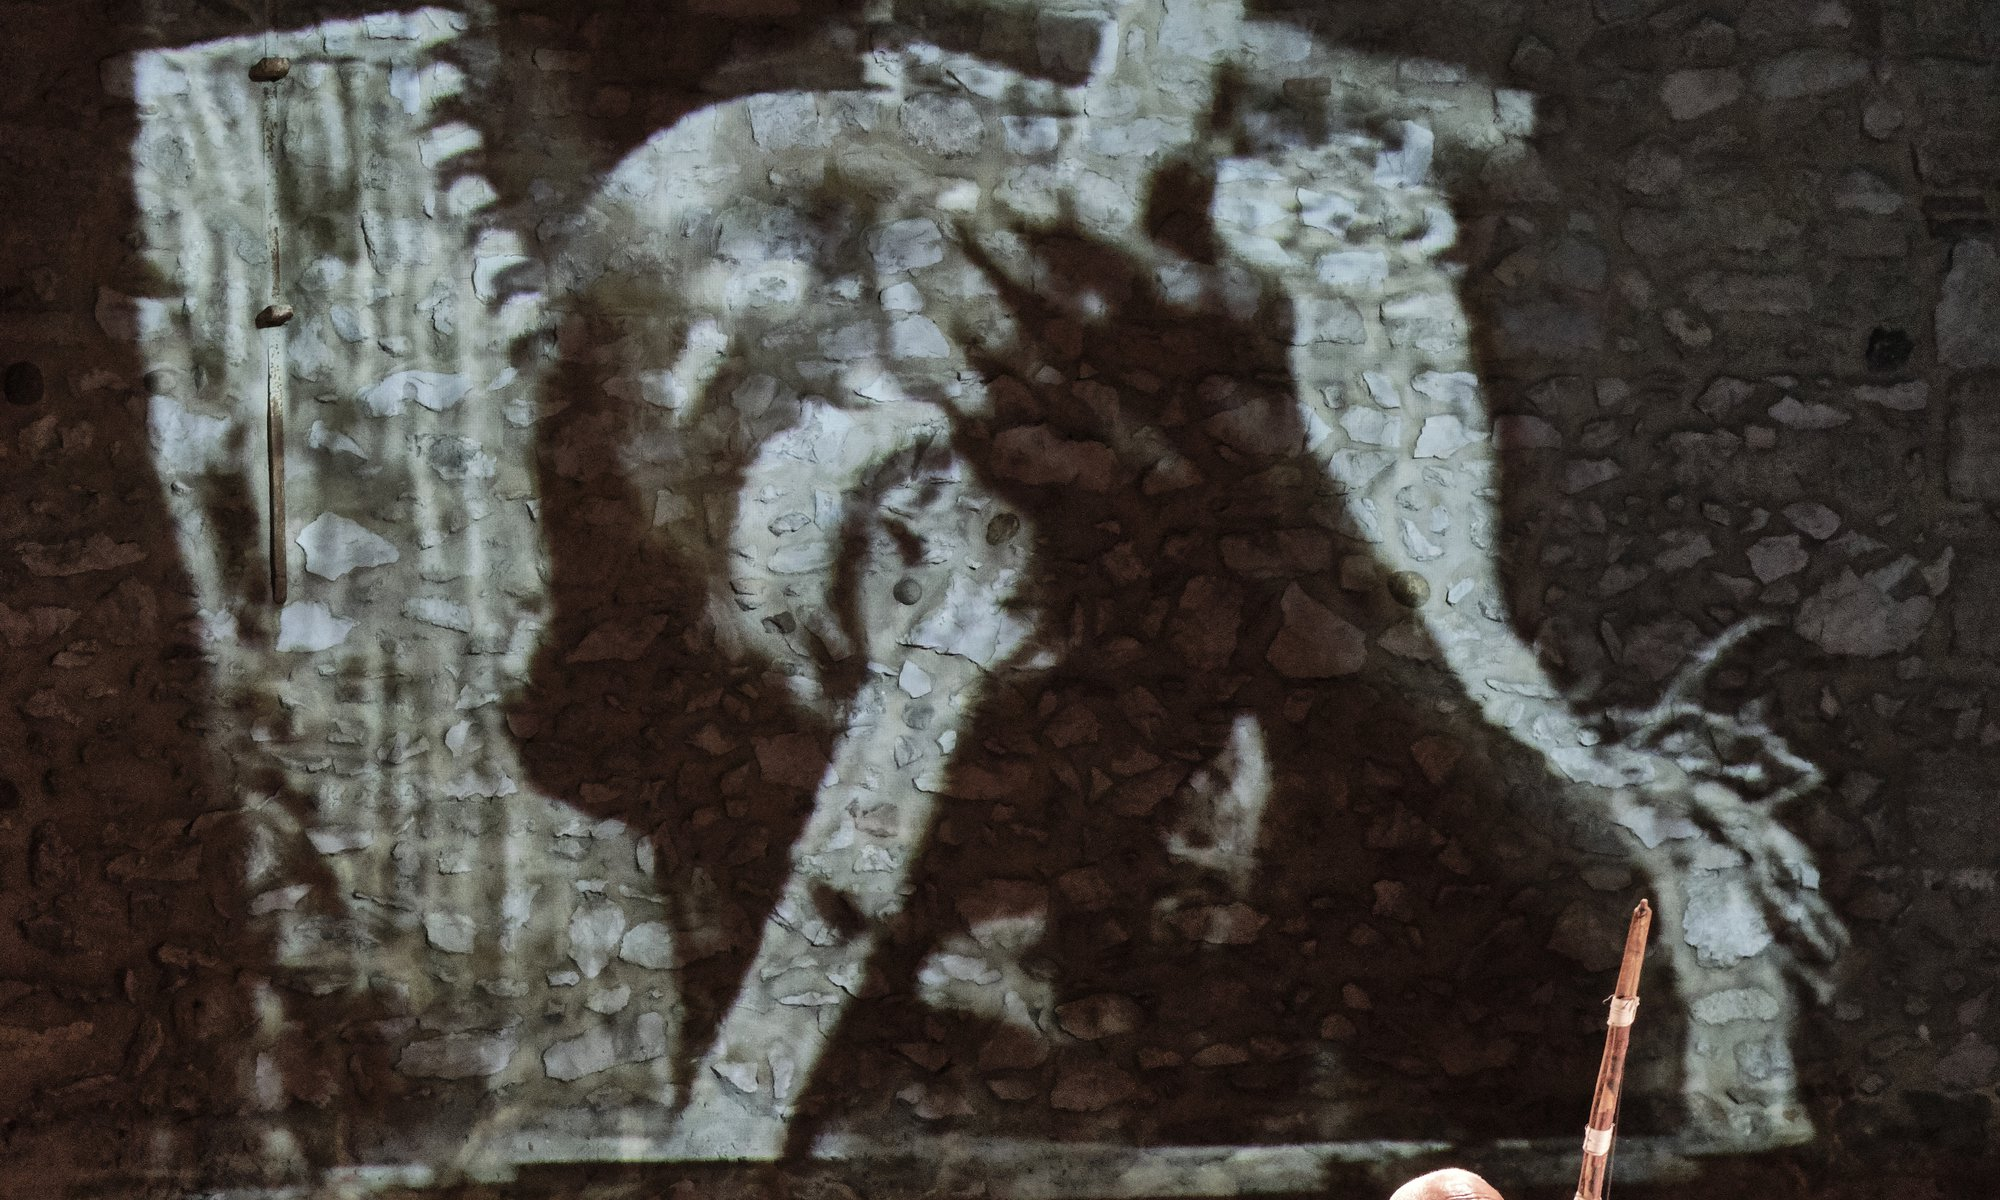 FAUSTIN LINYEKULA: HISTORIE(S) OF THEATRE II